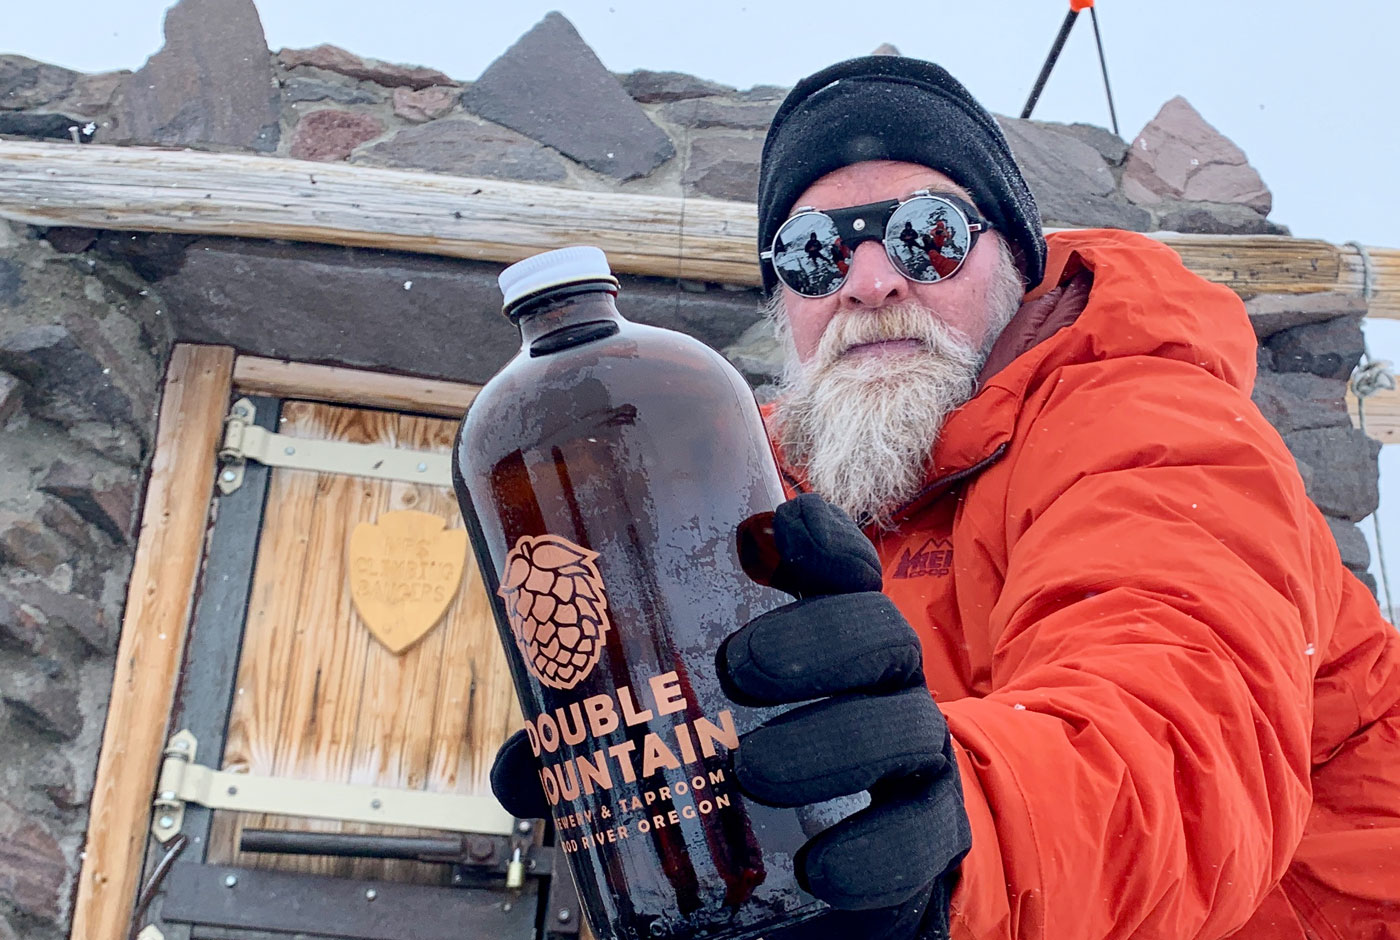 Beer-For-Clean-Air-Double-Mountain-calendar